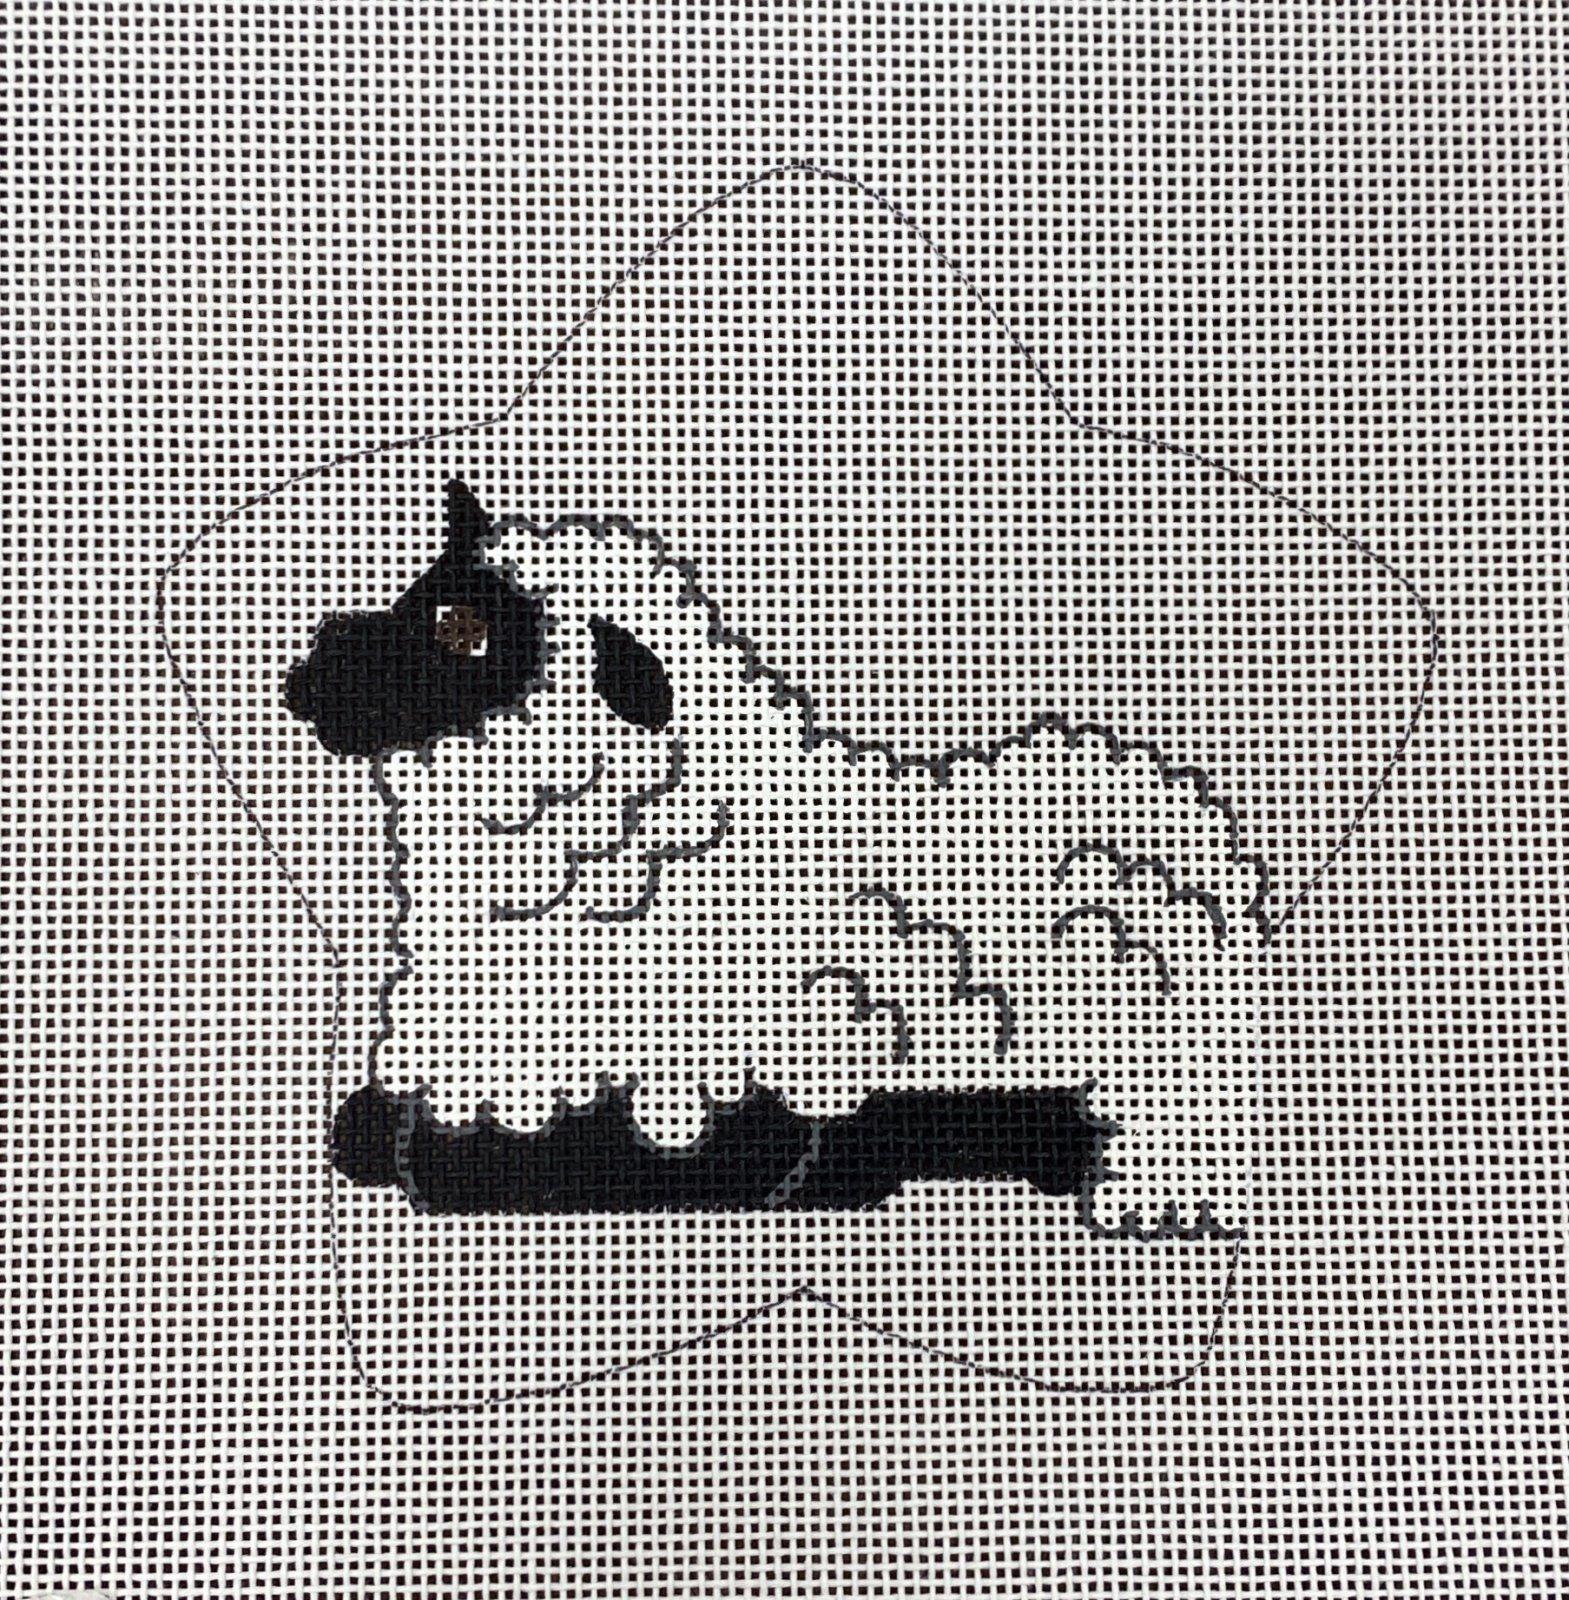 lamb star*